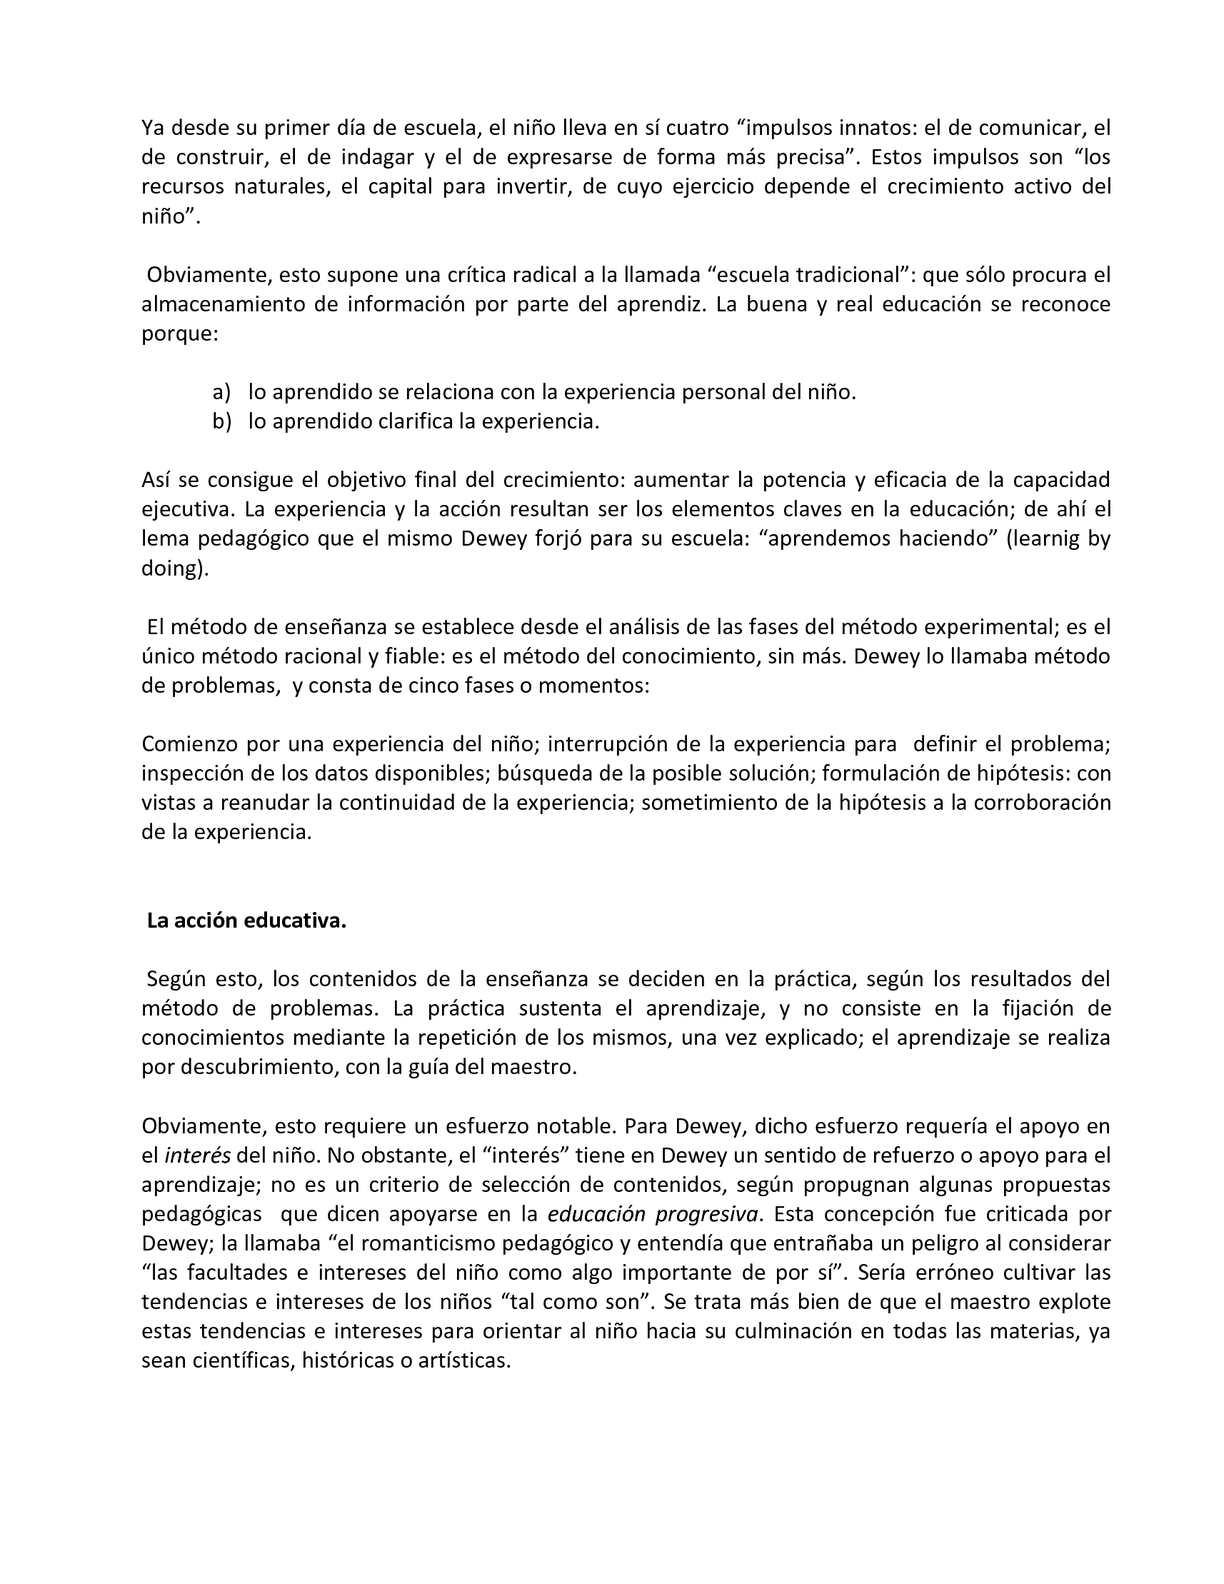 Enfoques Teóricos de Educacion - CALAMEO Downloader